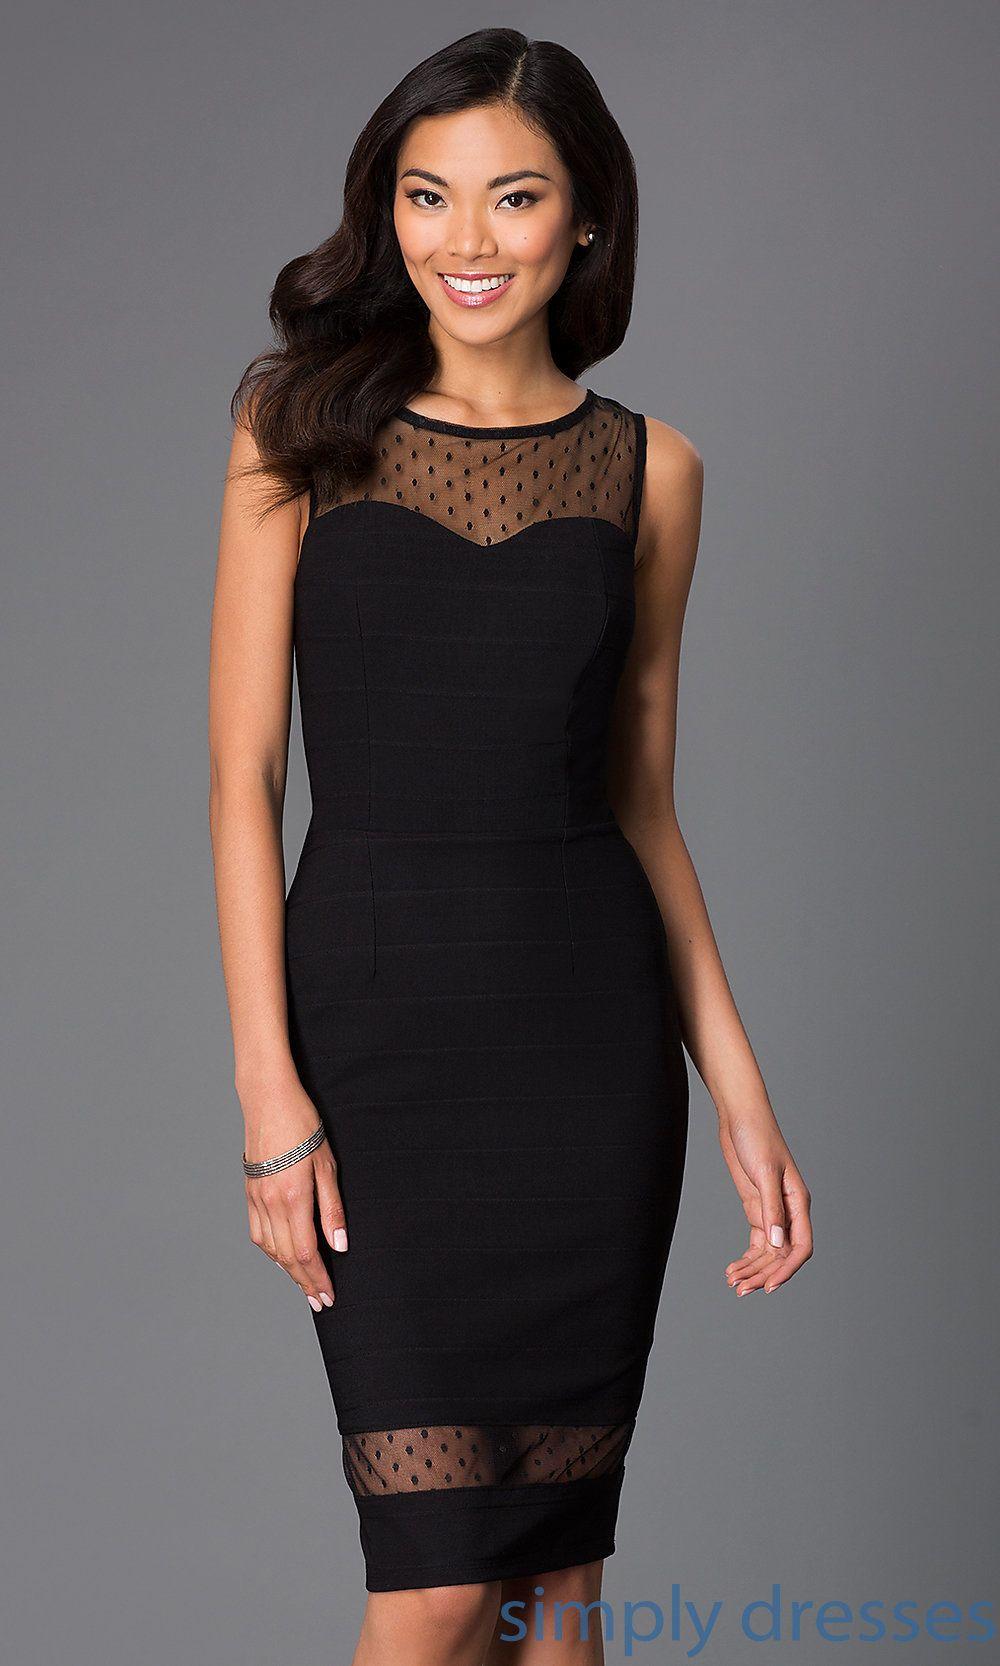 Homecoming dresses formal prom dresses evening wear sleeveless